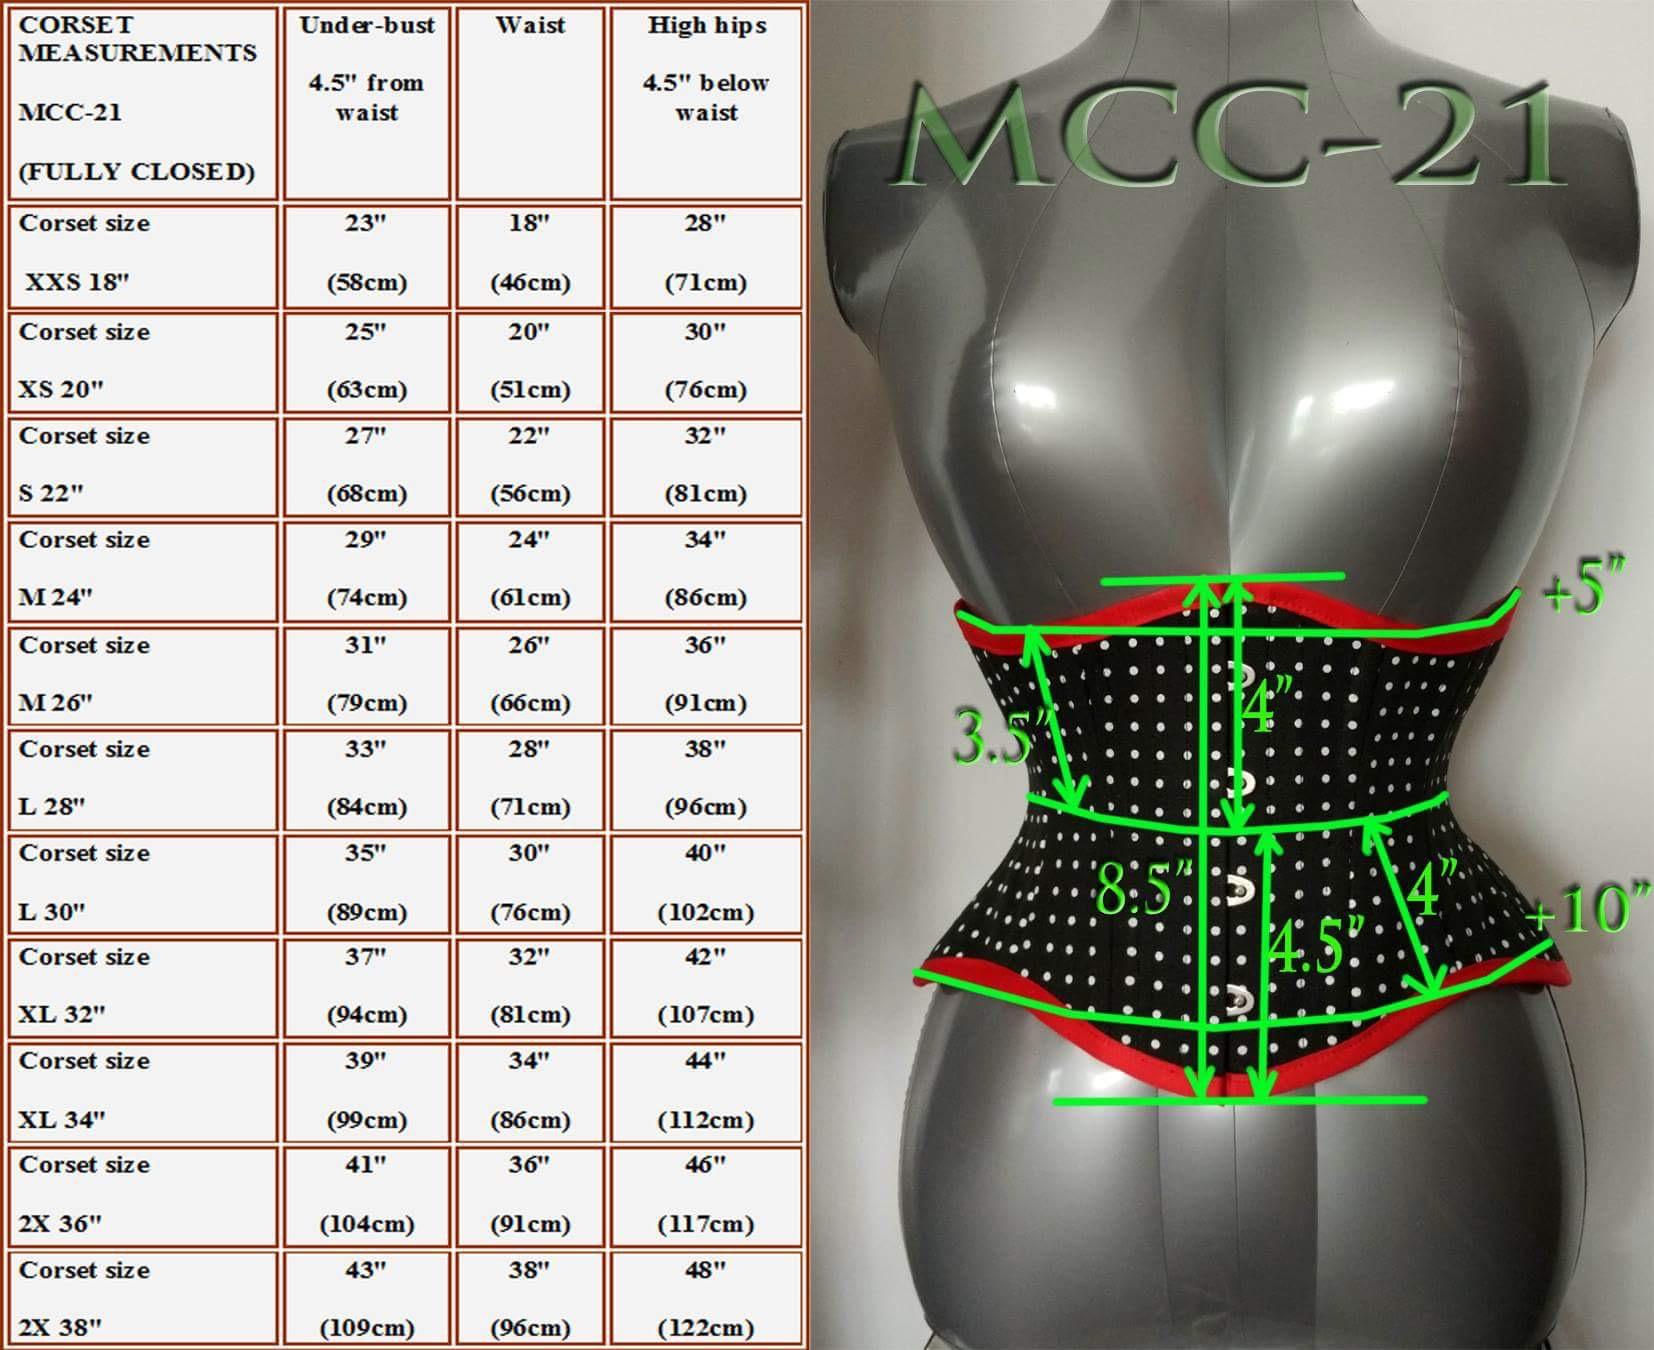 MCC21 Brocade Mesh Underbust Corset